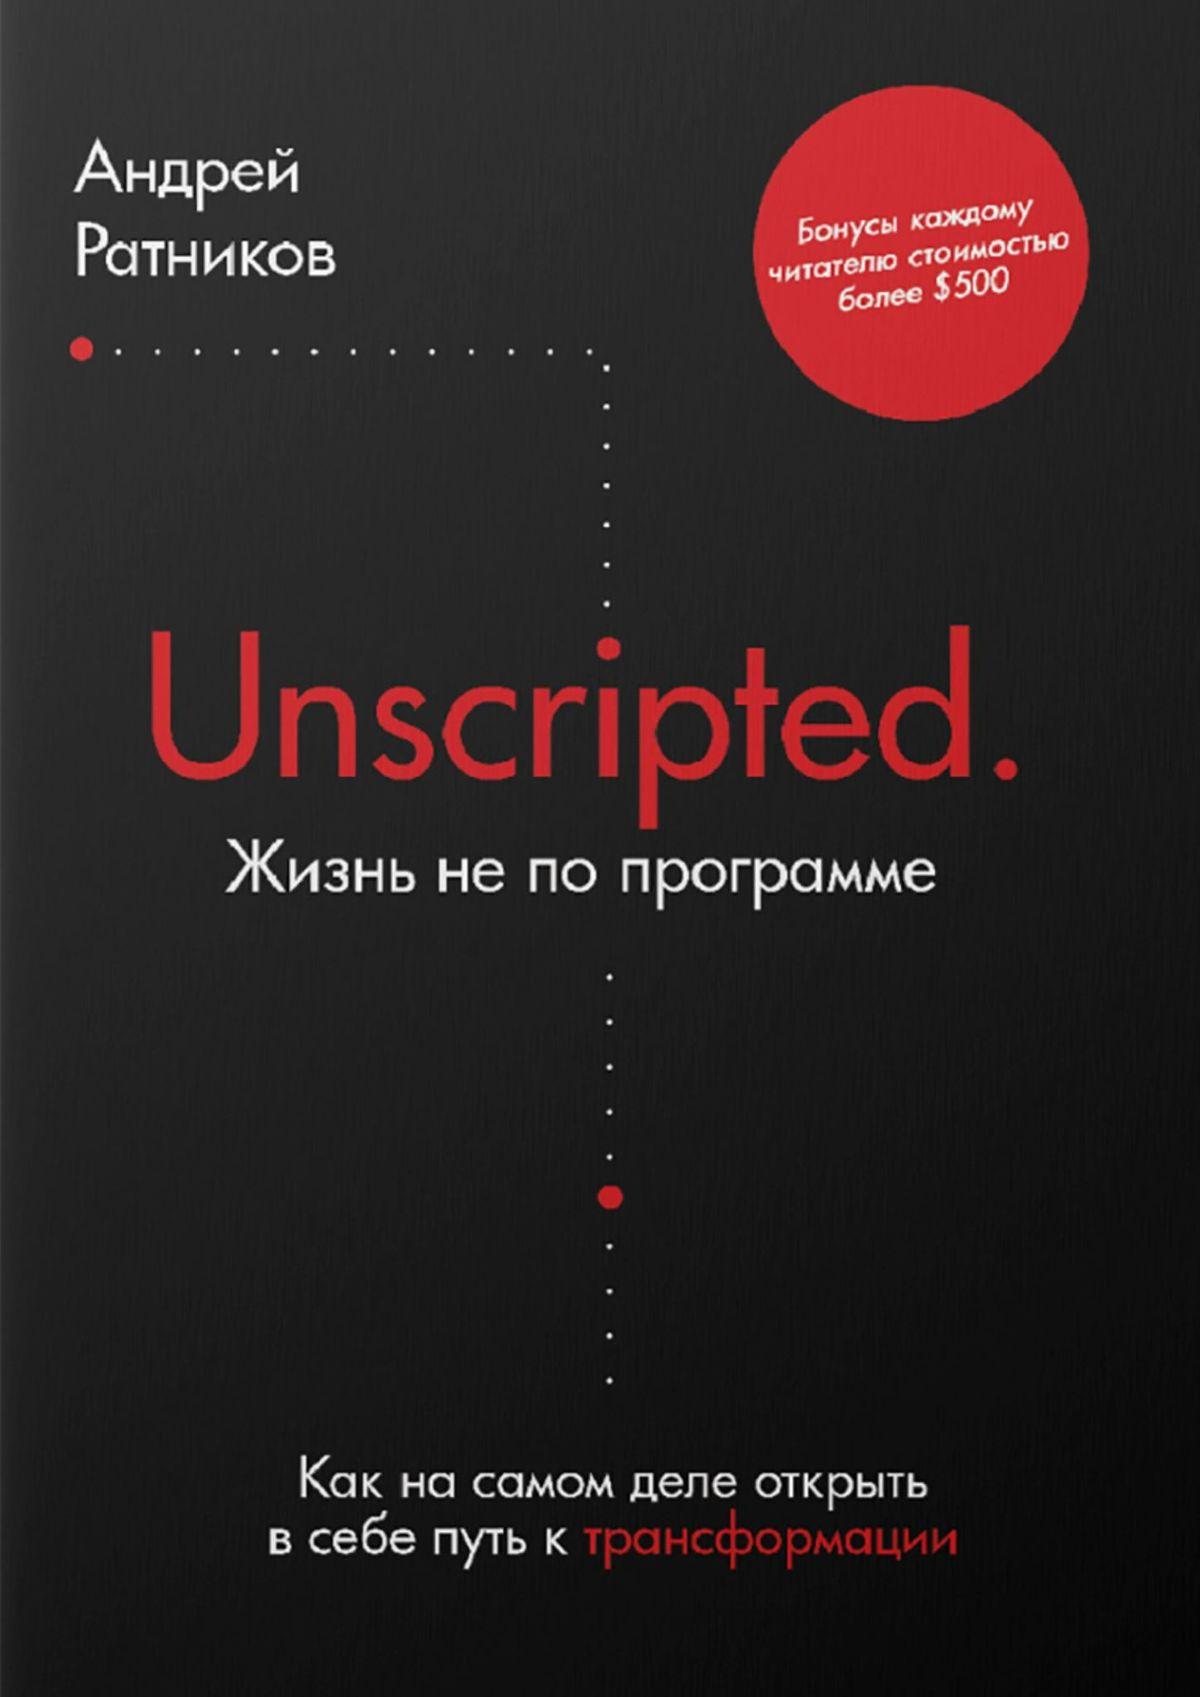 Андрей Александрович Ратников Unscripted. Жизнь непопрограмме андрей александрович ратников unscripted жизнь непопрограмме